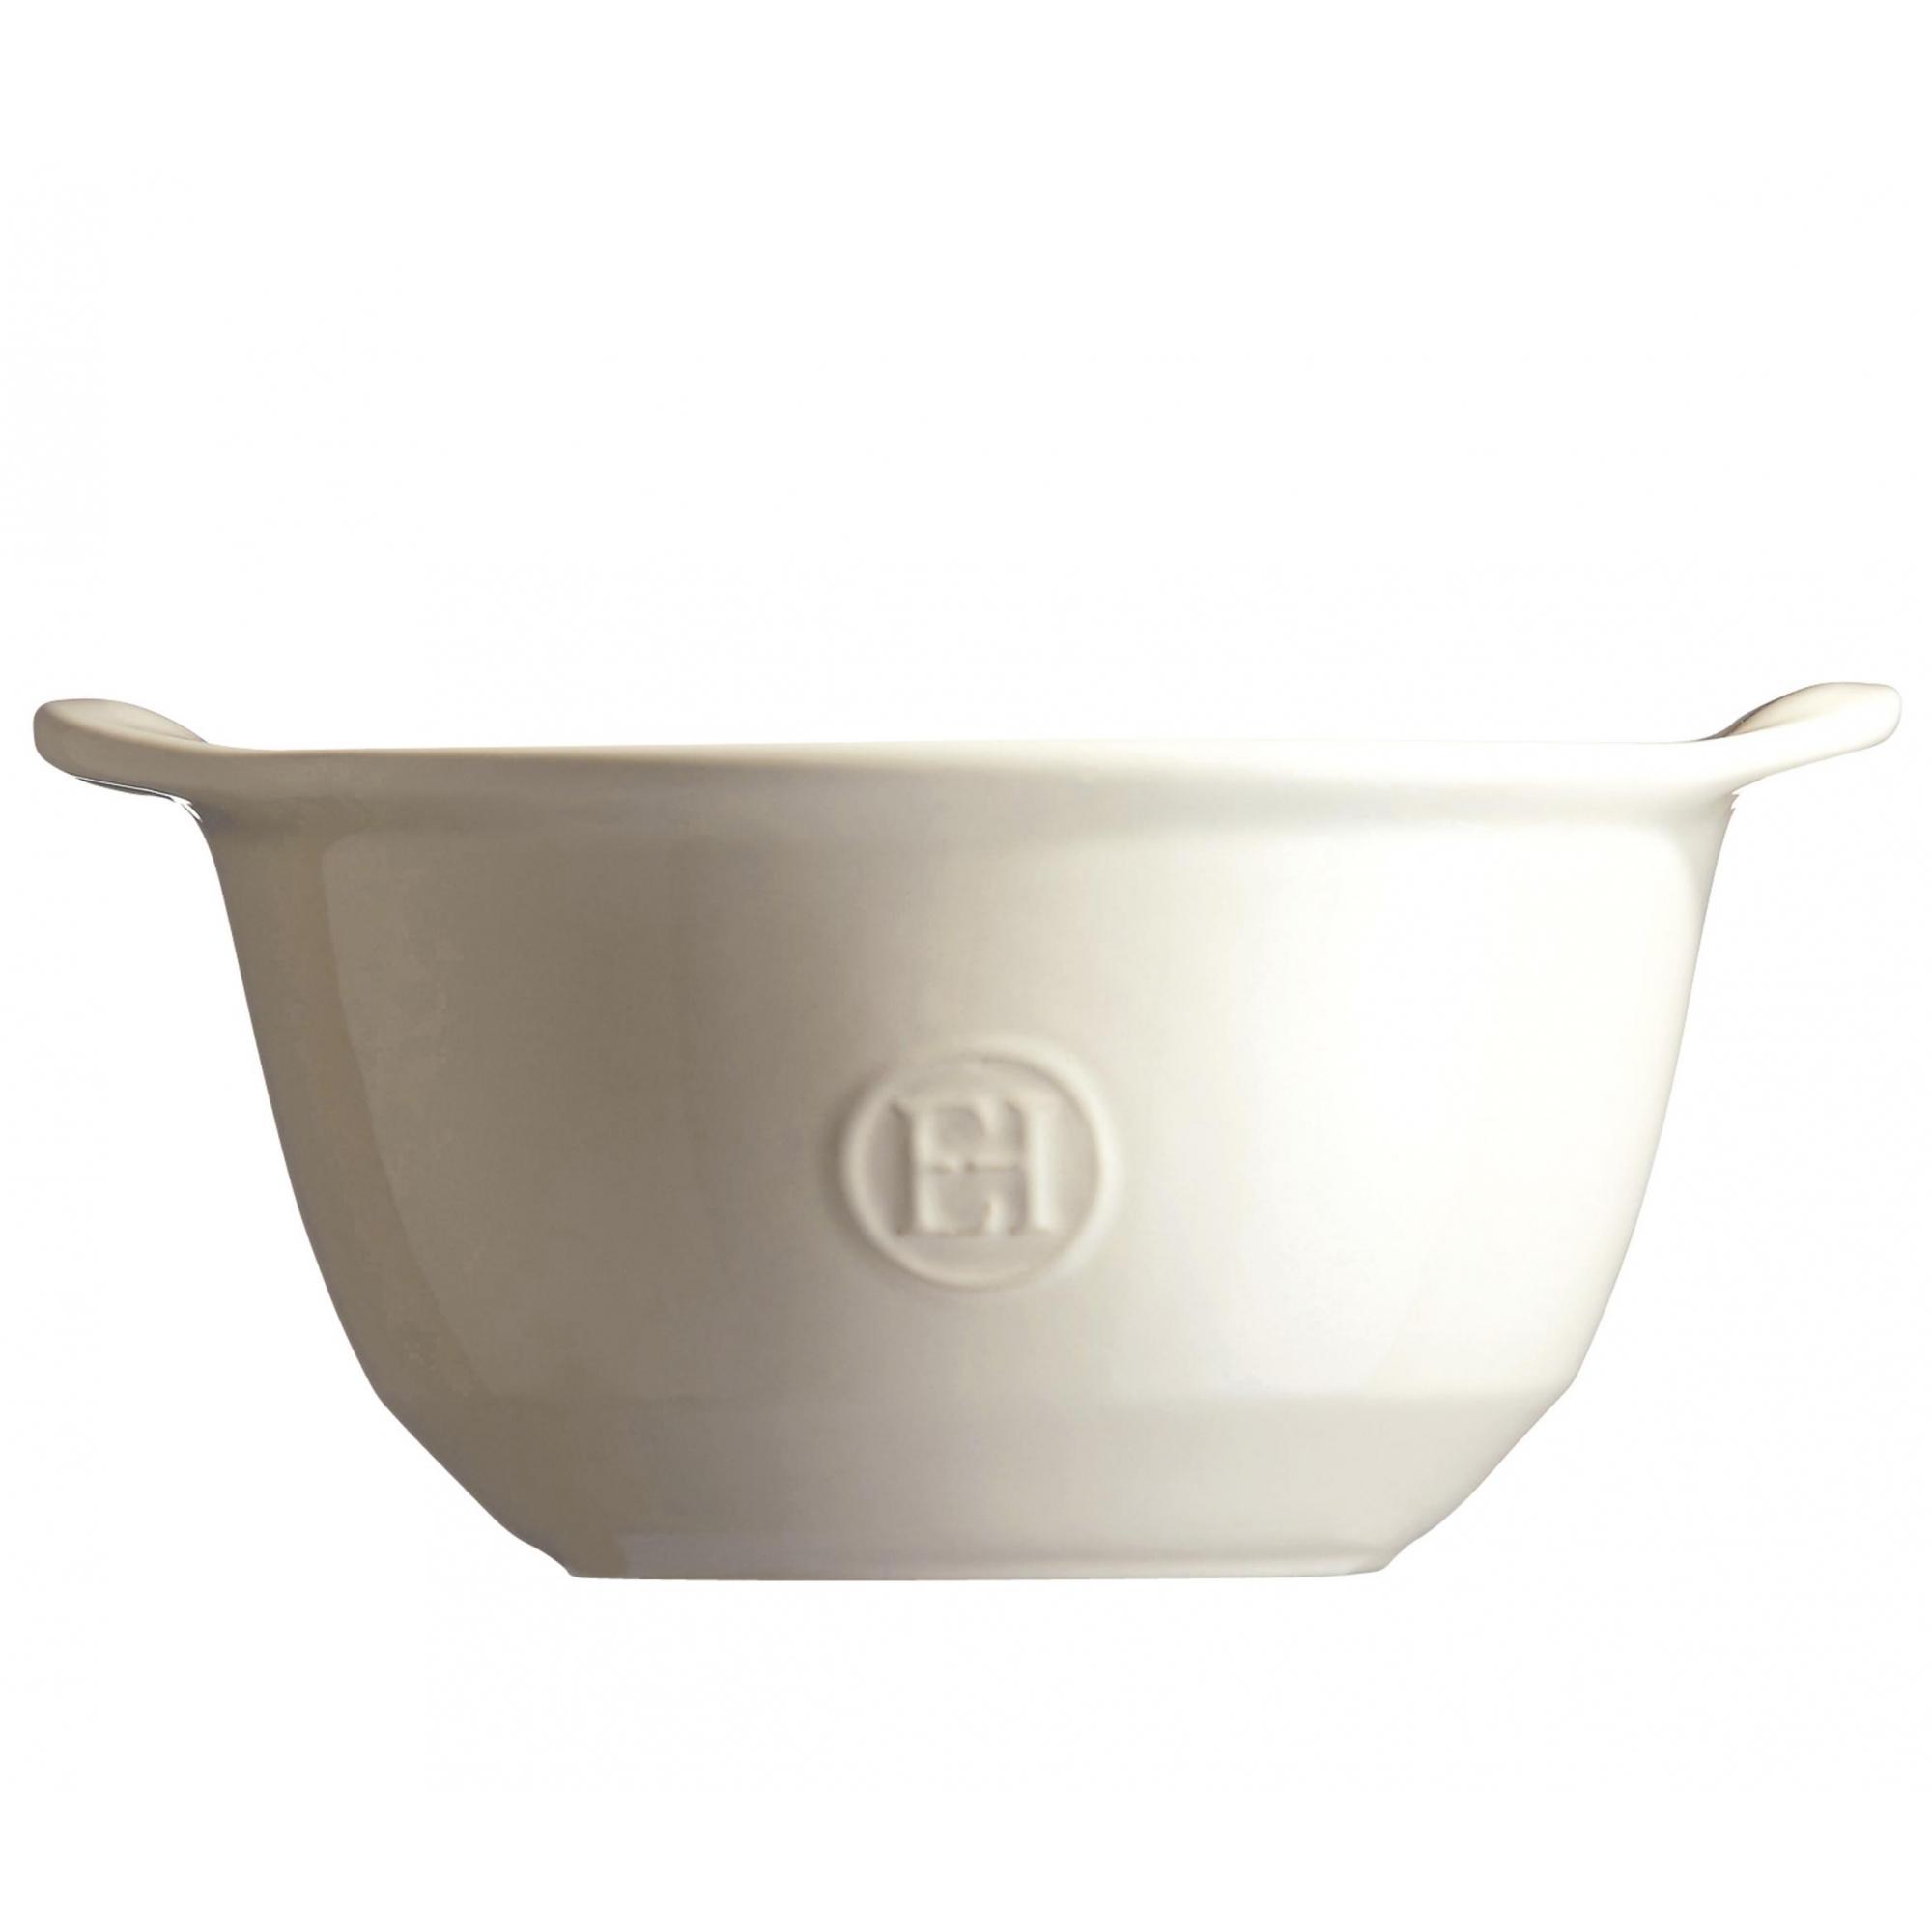 Kit 2 Bowls Cerâmica Gratinar 550 ml até 270 °C Emile Henry